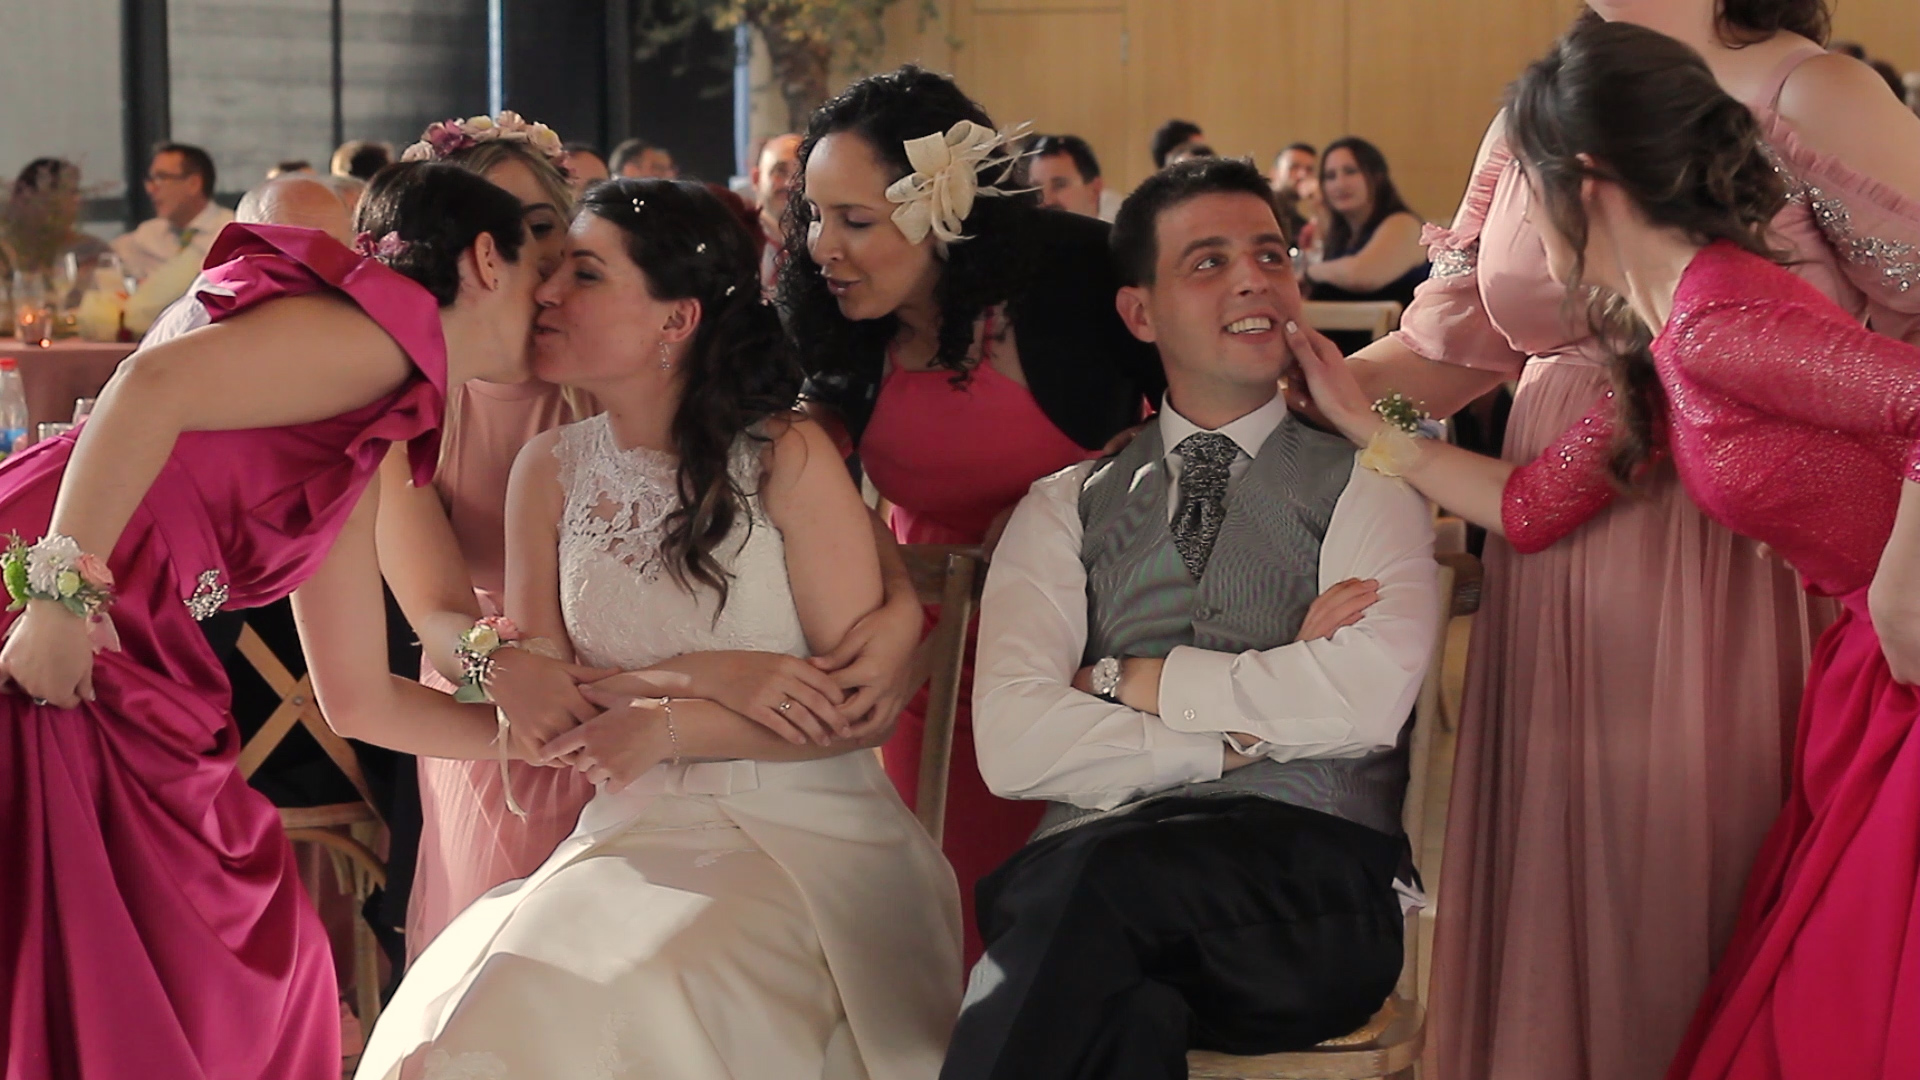 La pareja reciben una sorpresa de sus amigas. Boda en La Opera